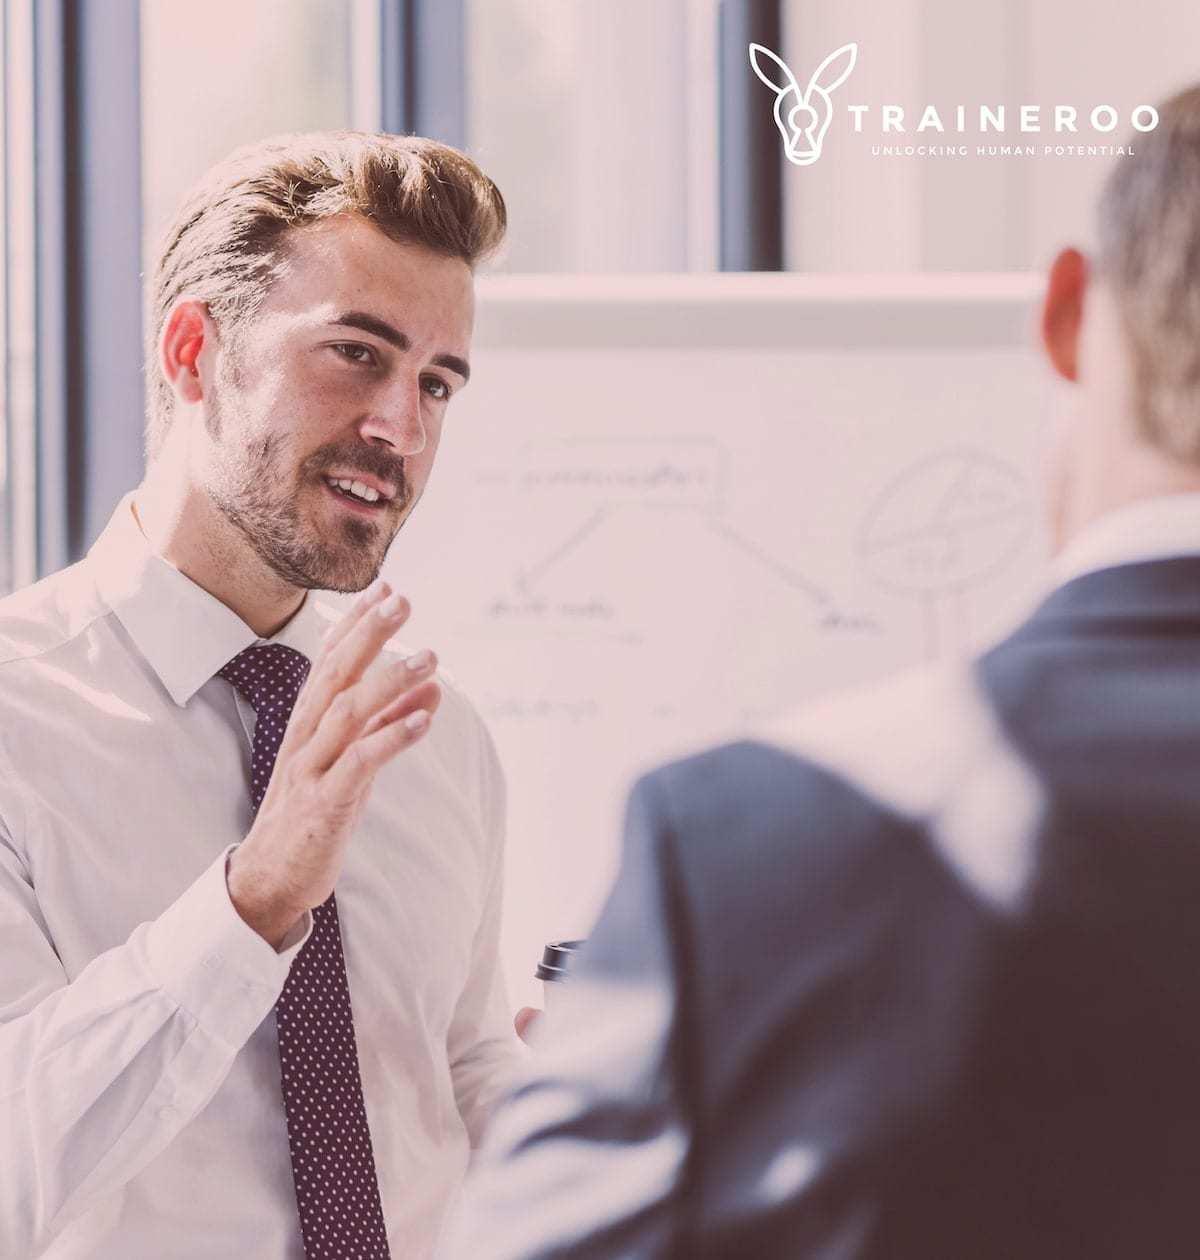 On-the-job Coaching - Traineroo